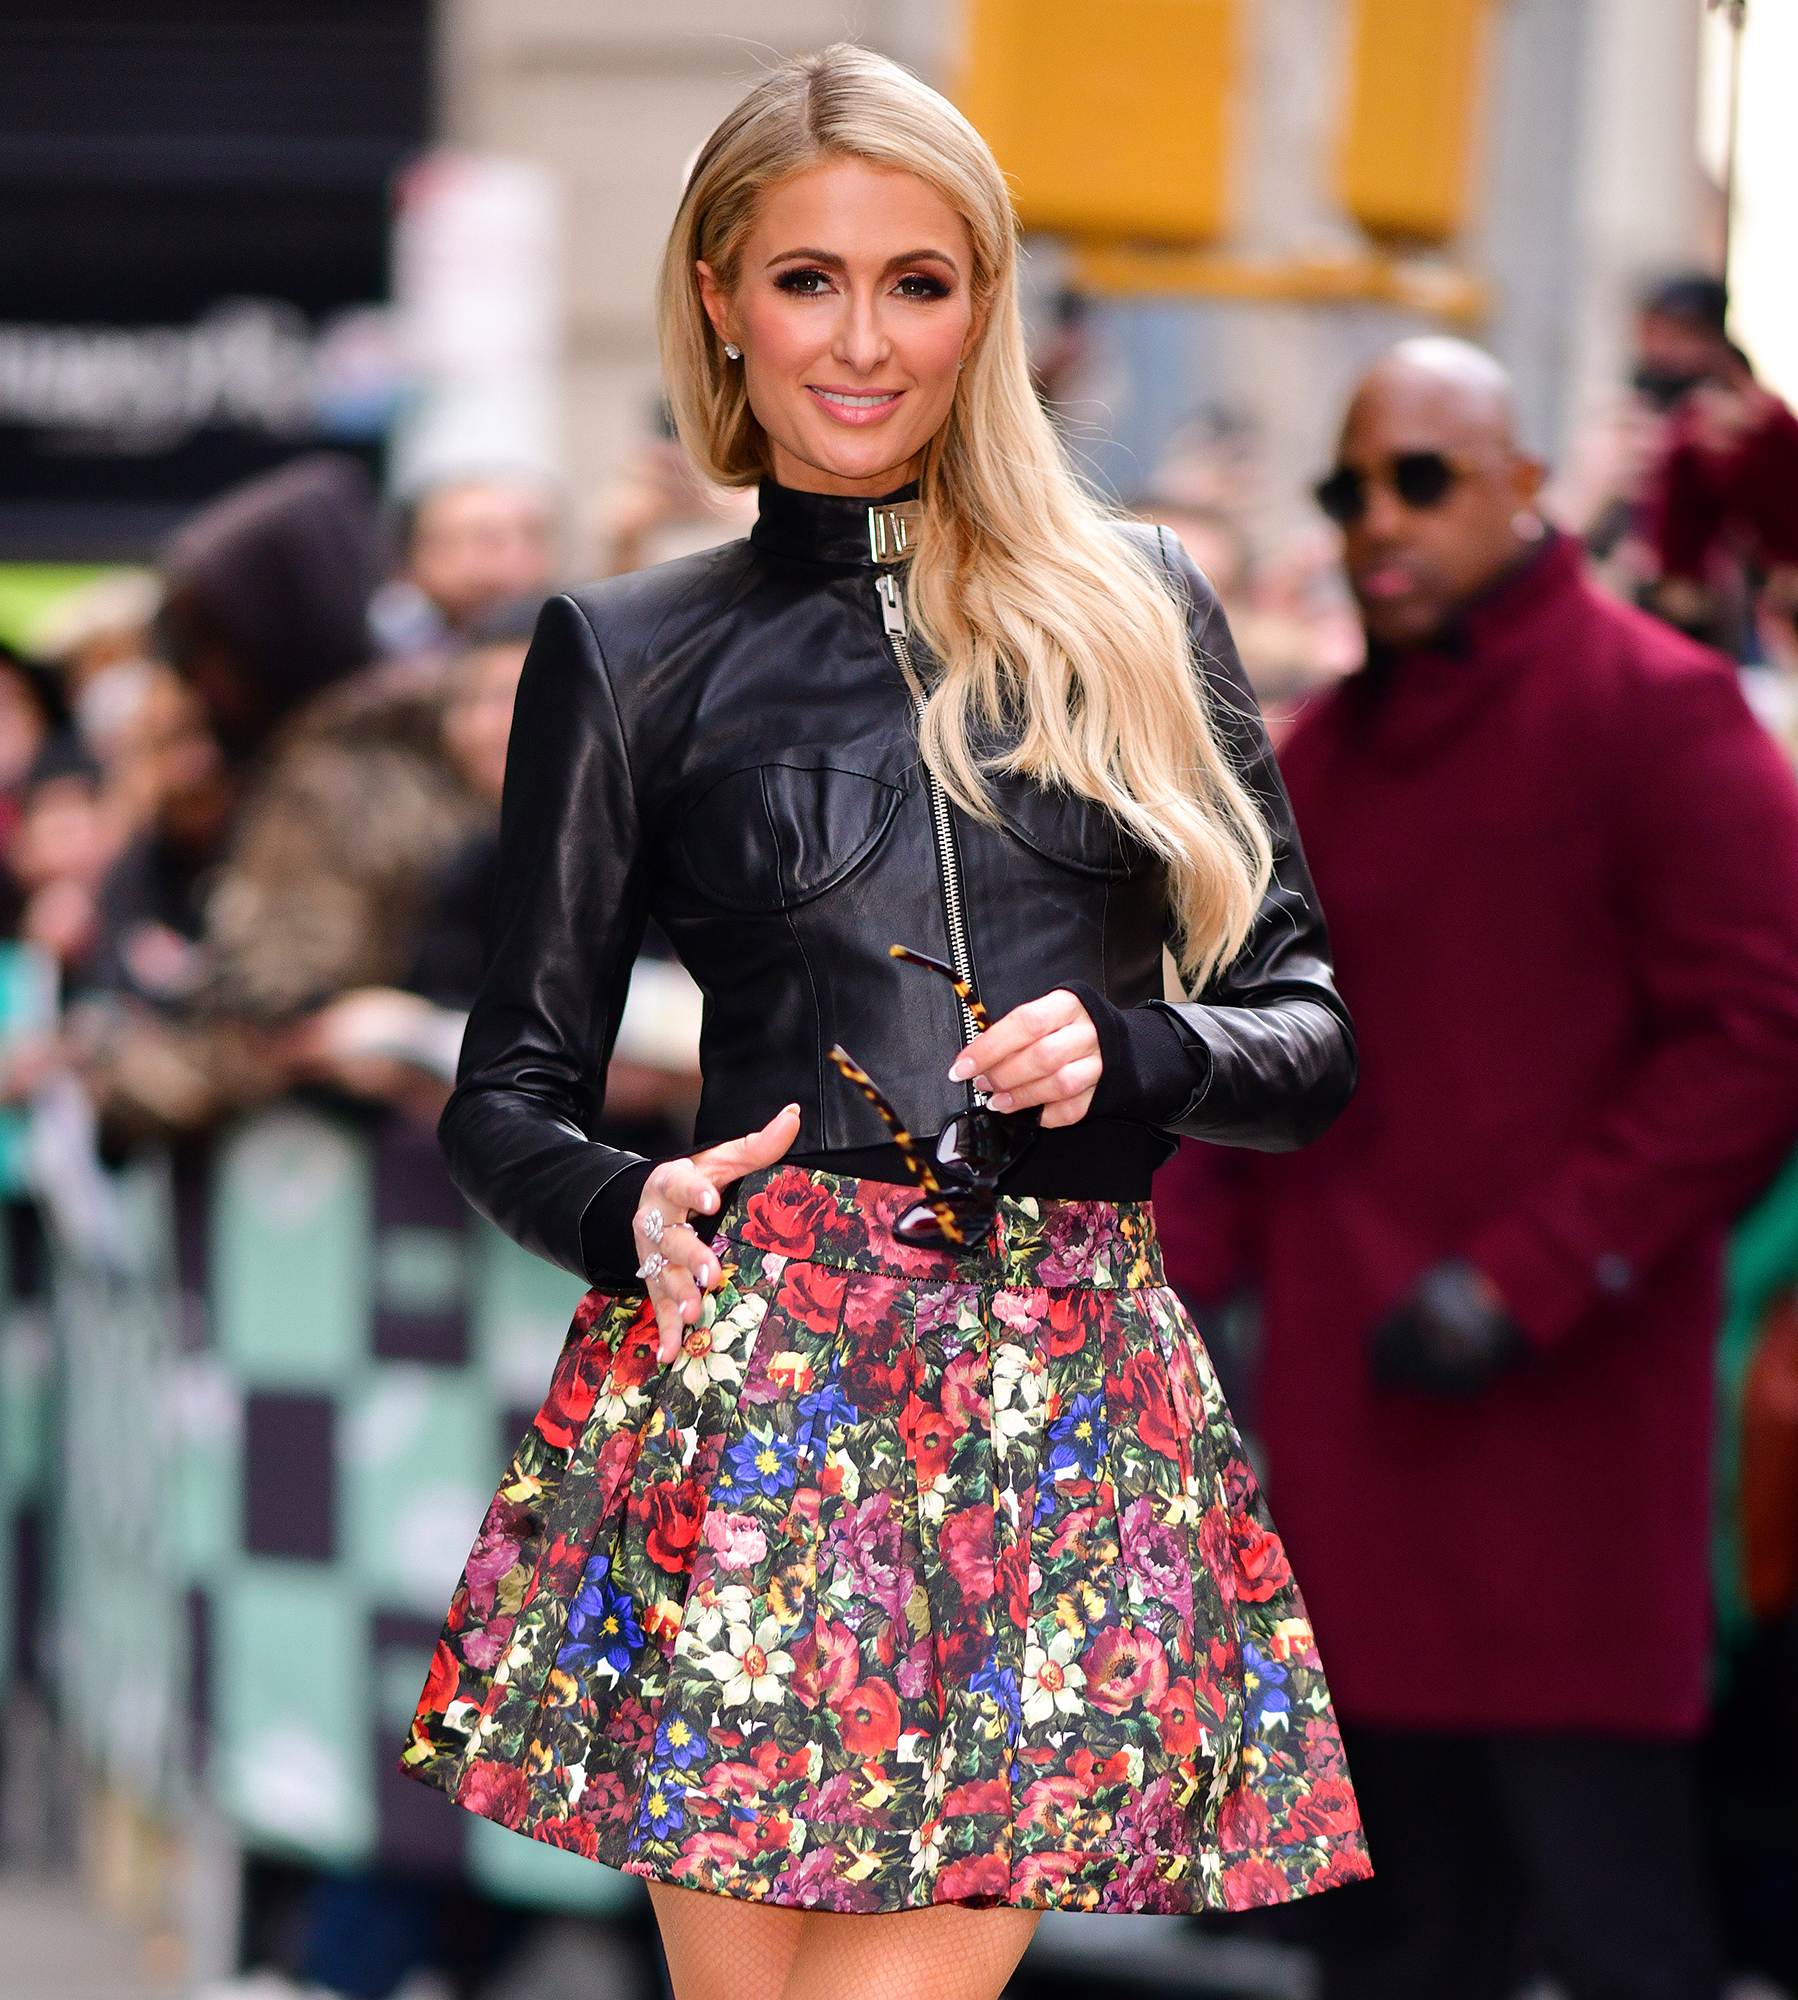 Paris Hilton So Happy After Chris Zylka Split - Paris Hilton leaves Build Studios on December 19, 2018 in New York City.